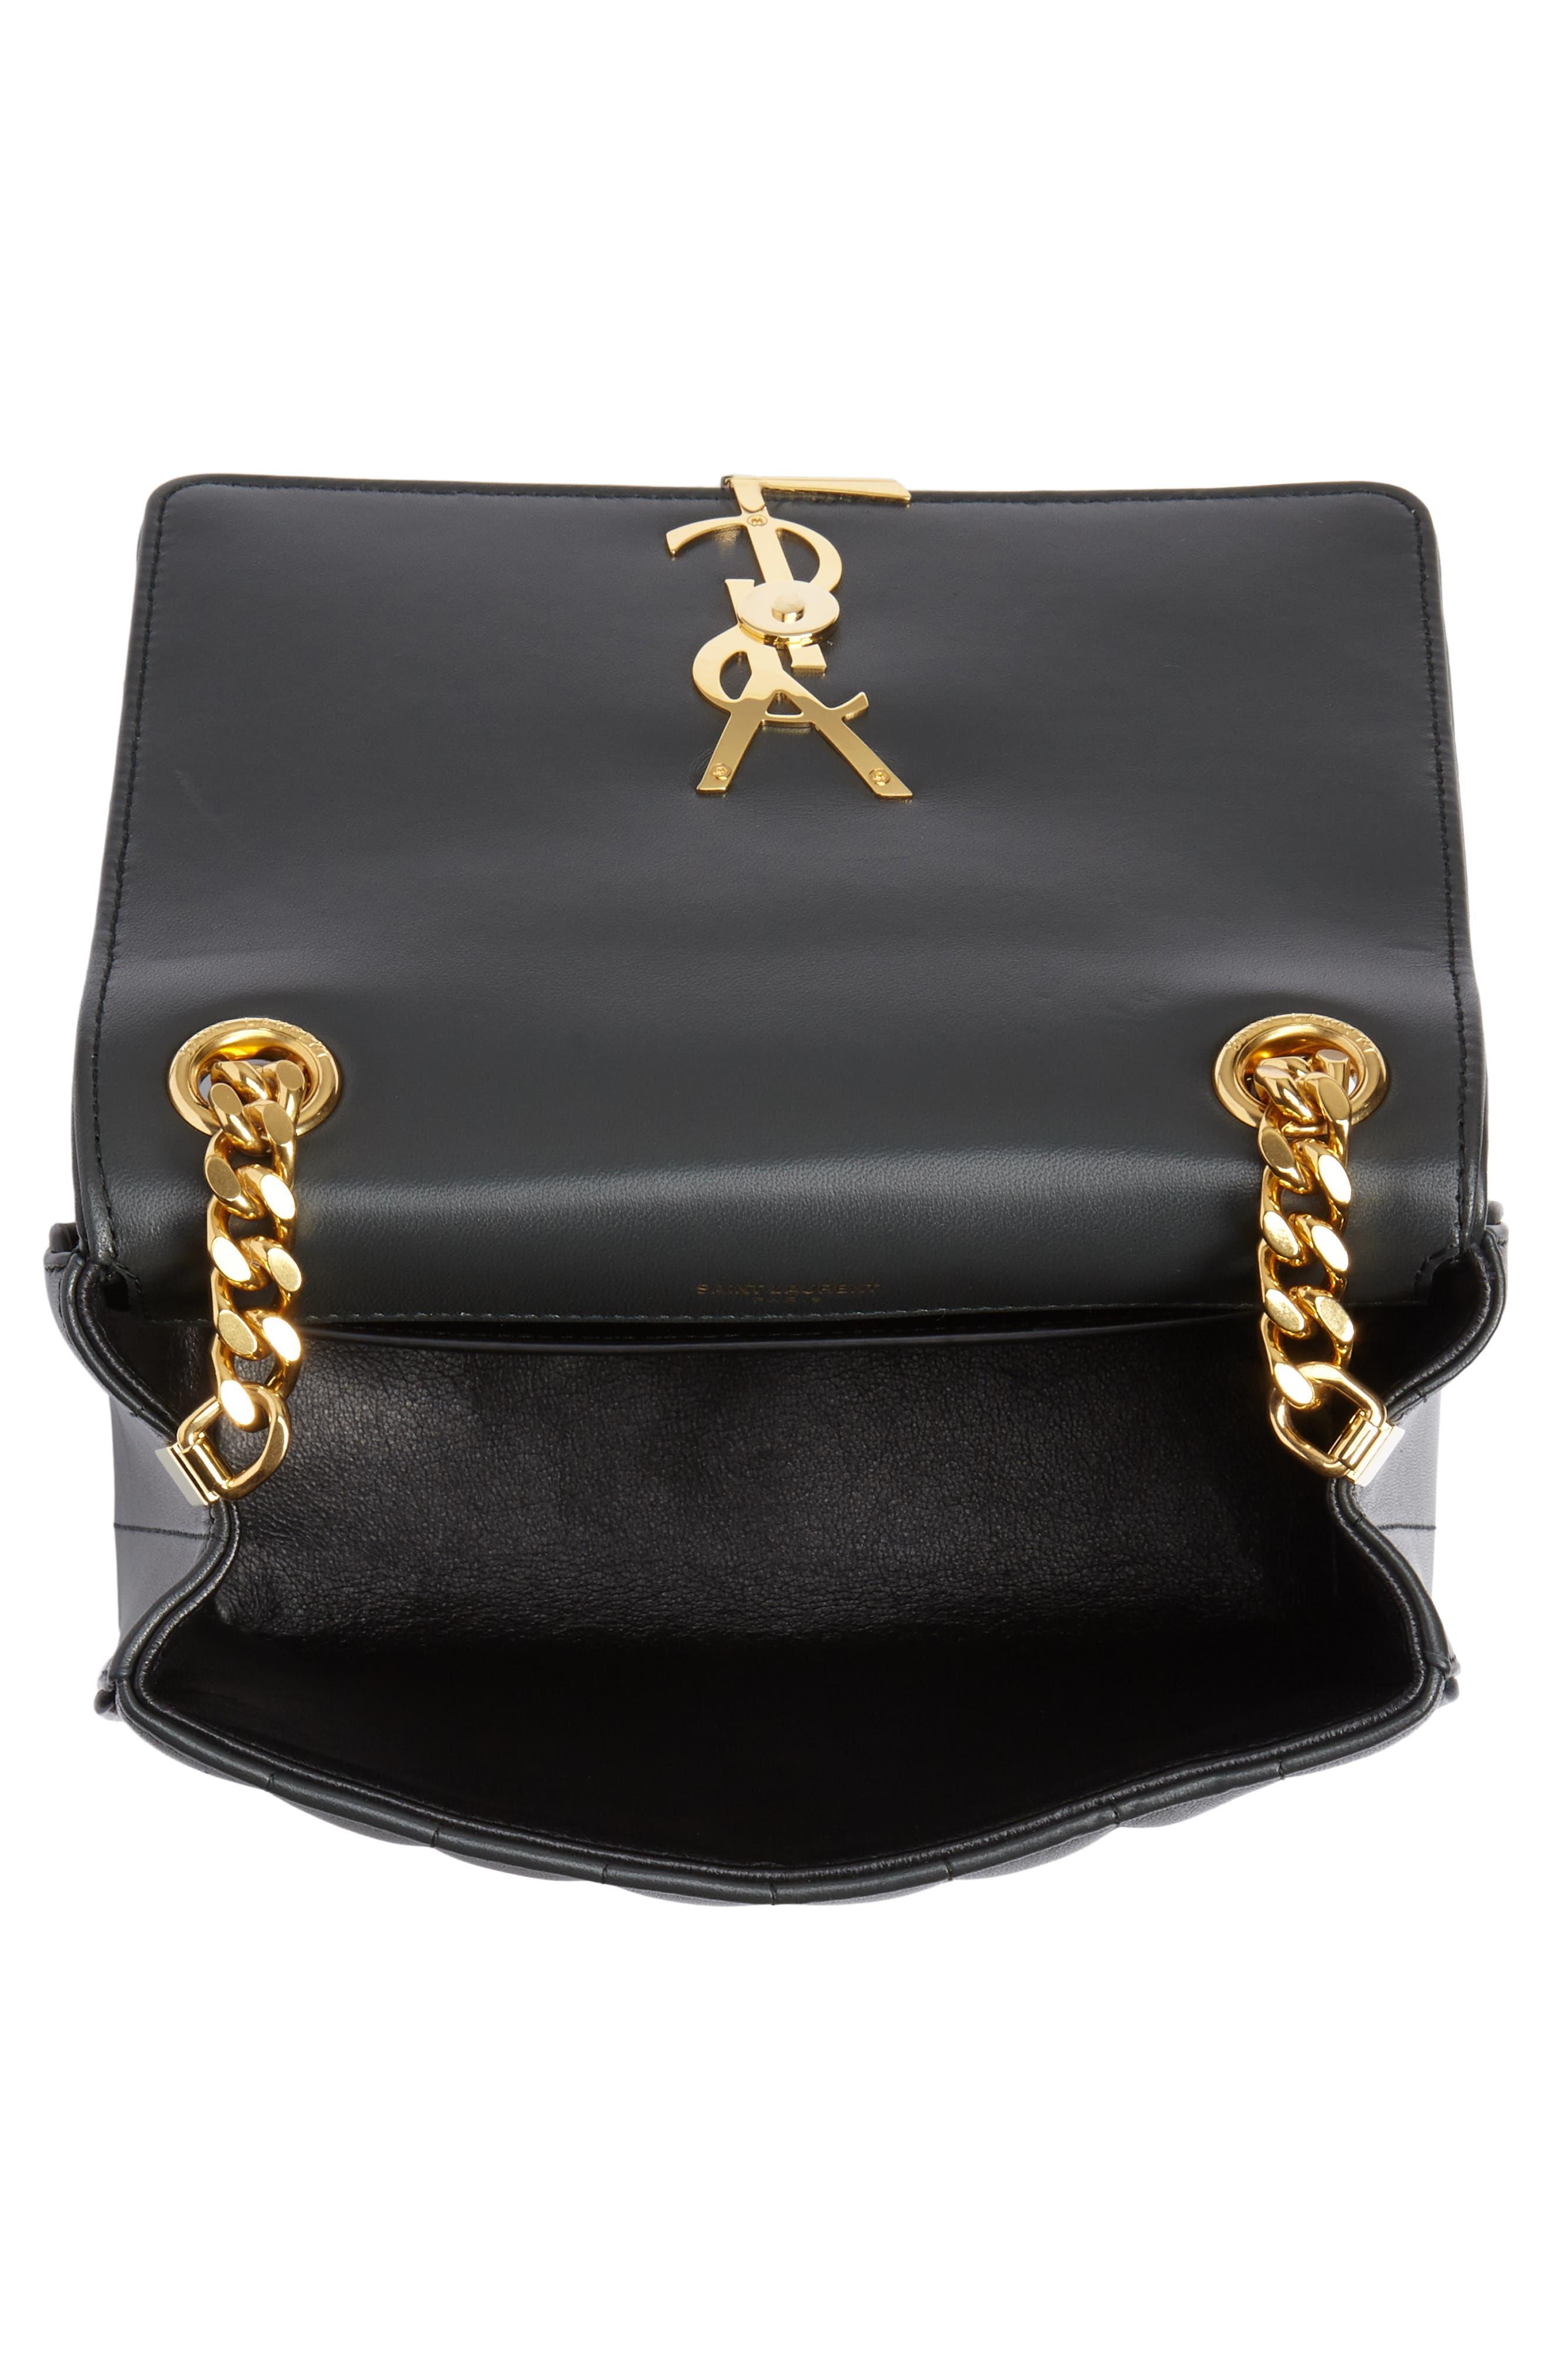 Medium Vicky Leather Crossbody Bag,                             Alternate thumbnail 4, color,                             ALGAE